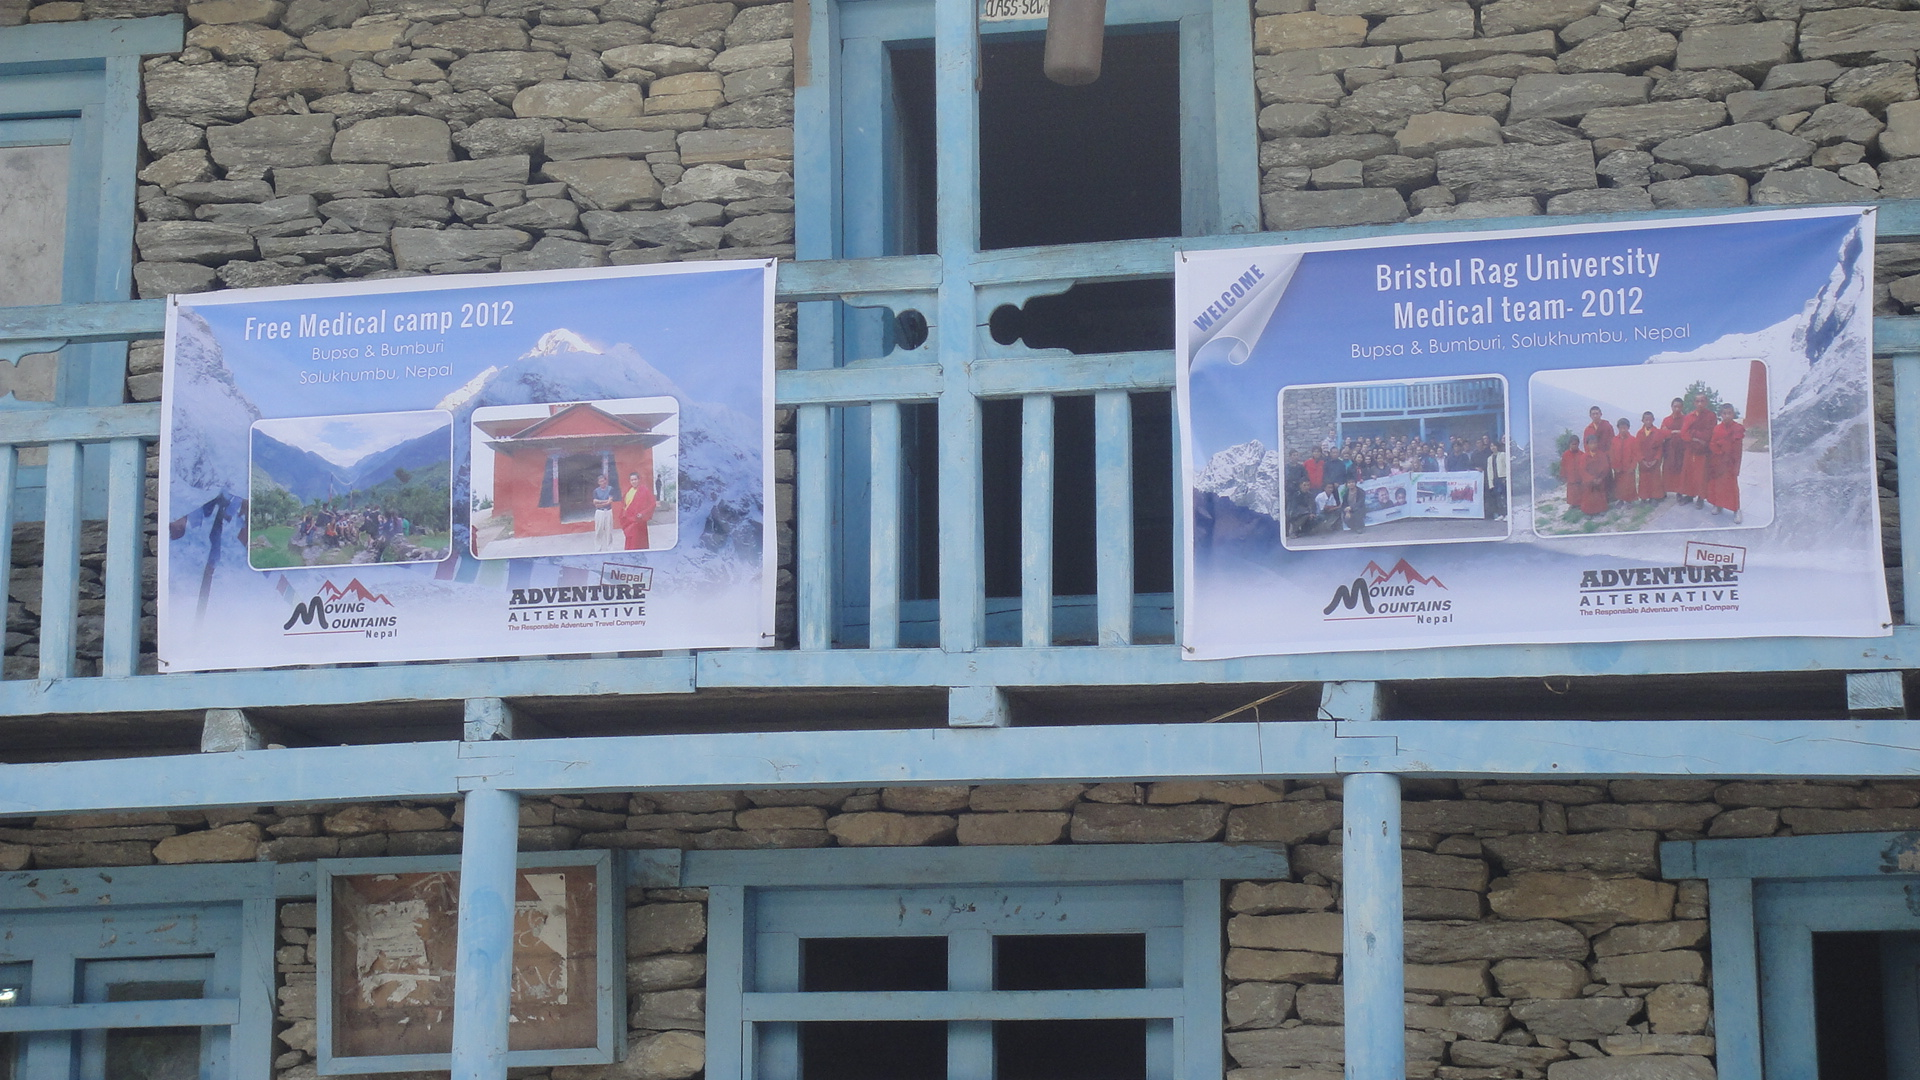 Volunteering_Mountain_University_Adventure_Alternative_Nepal.JPG